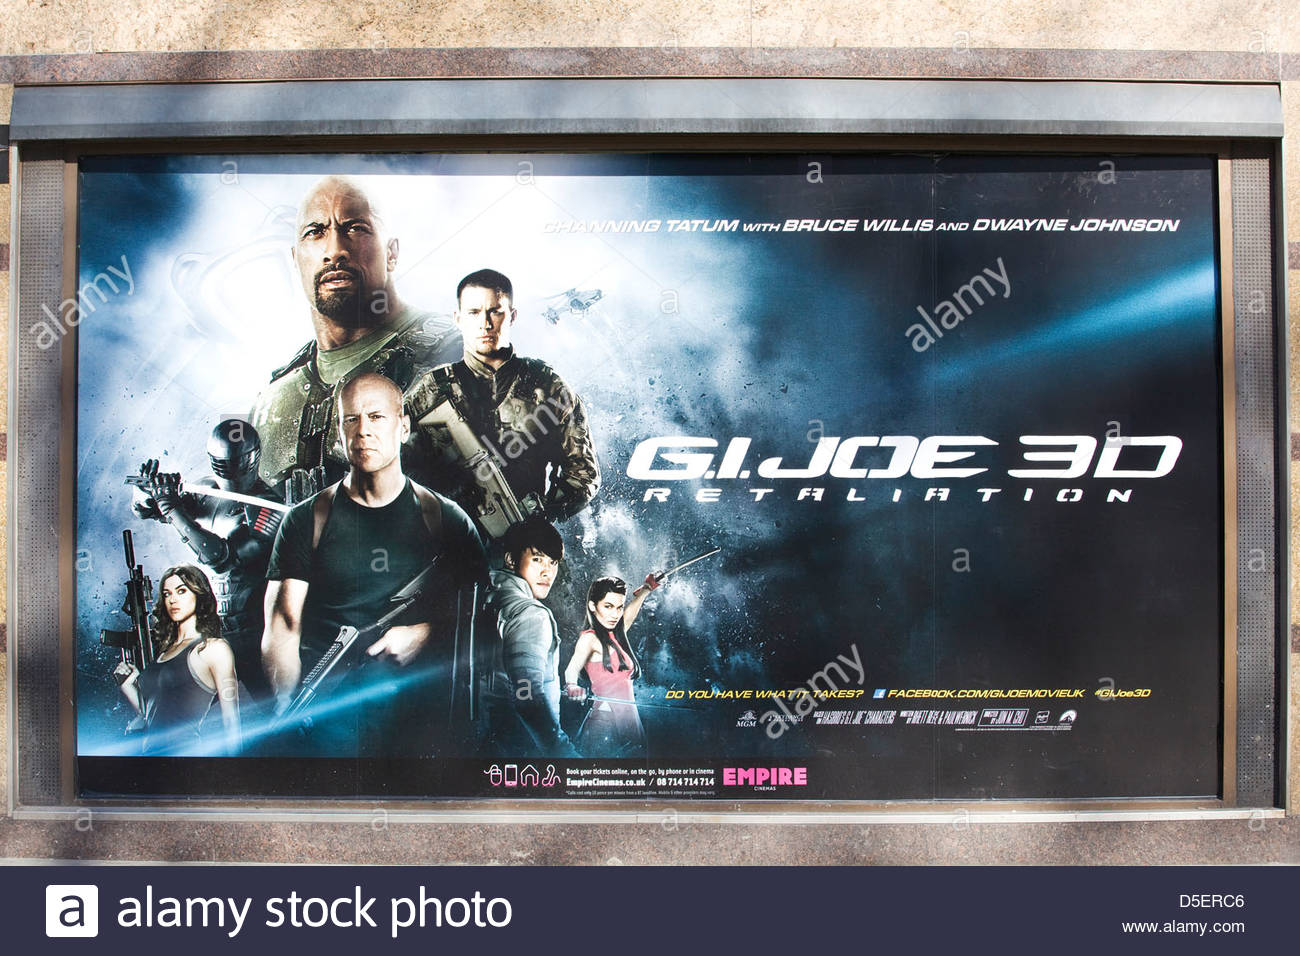 Movie poster advertising the film G.I. Joe Retaliation - Stock Image